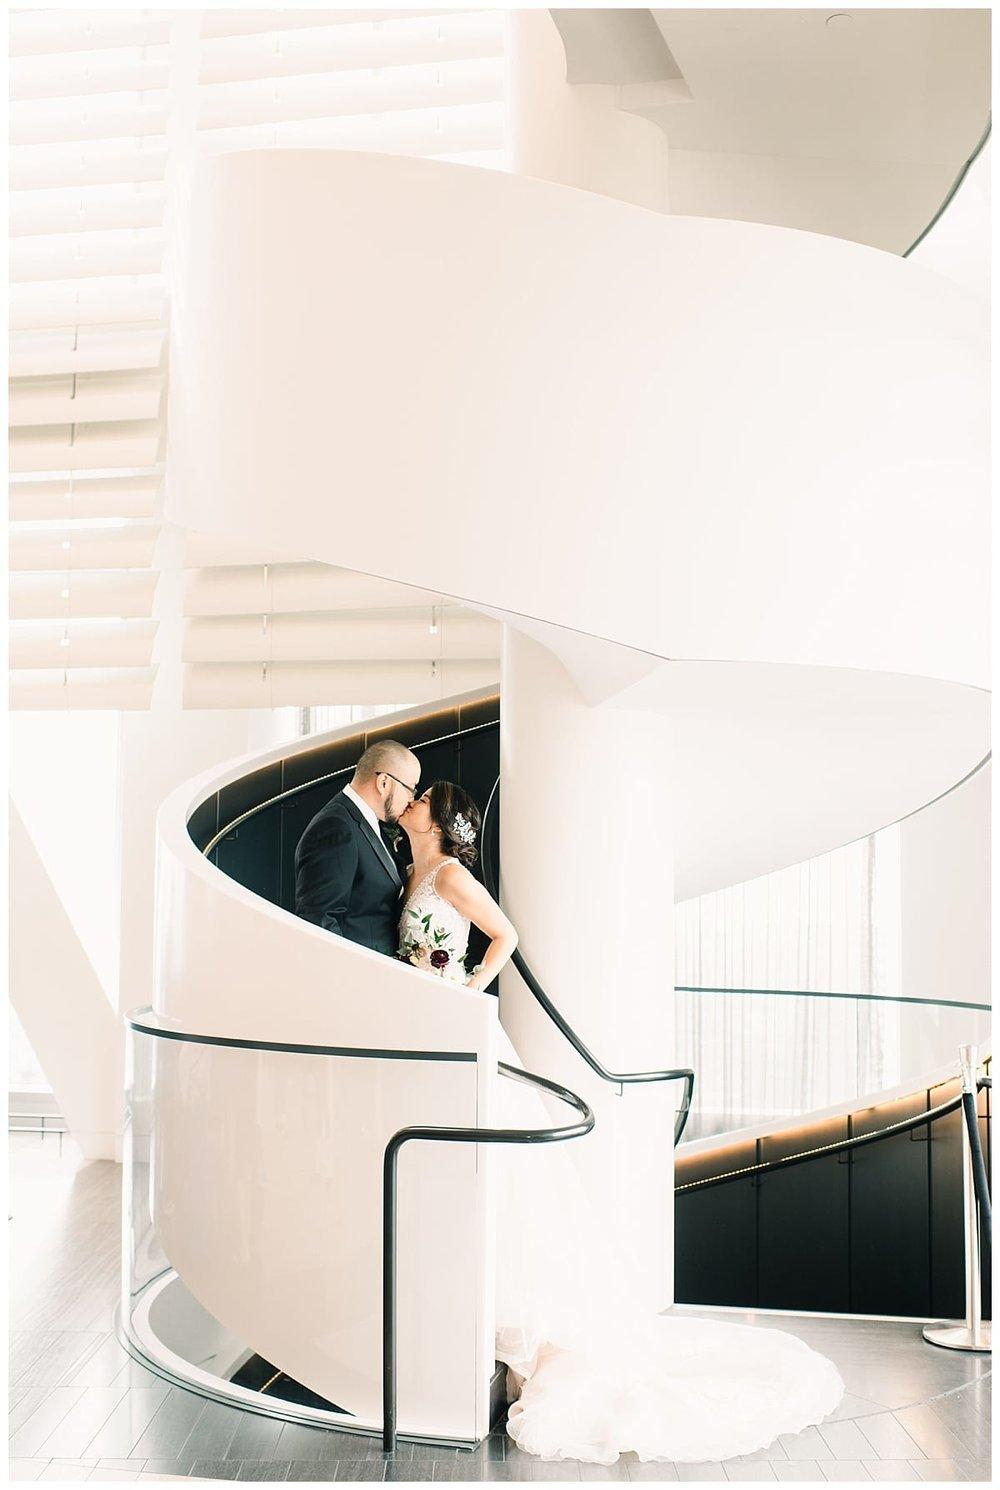 Intercontinental-Los-Angeles-Wedding-Carissa-Woo-Photography_0001.jpg